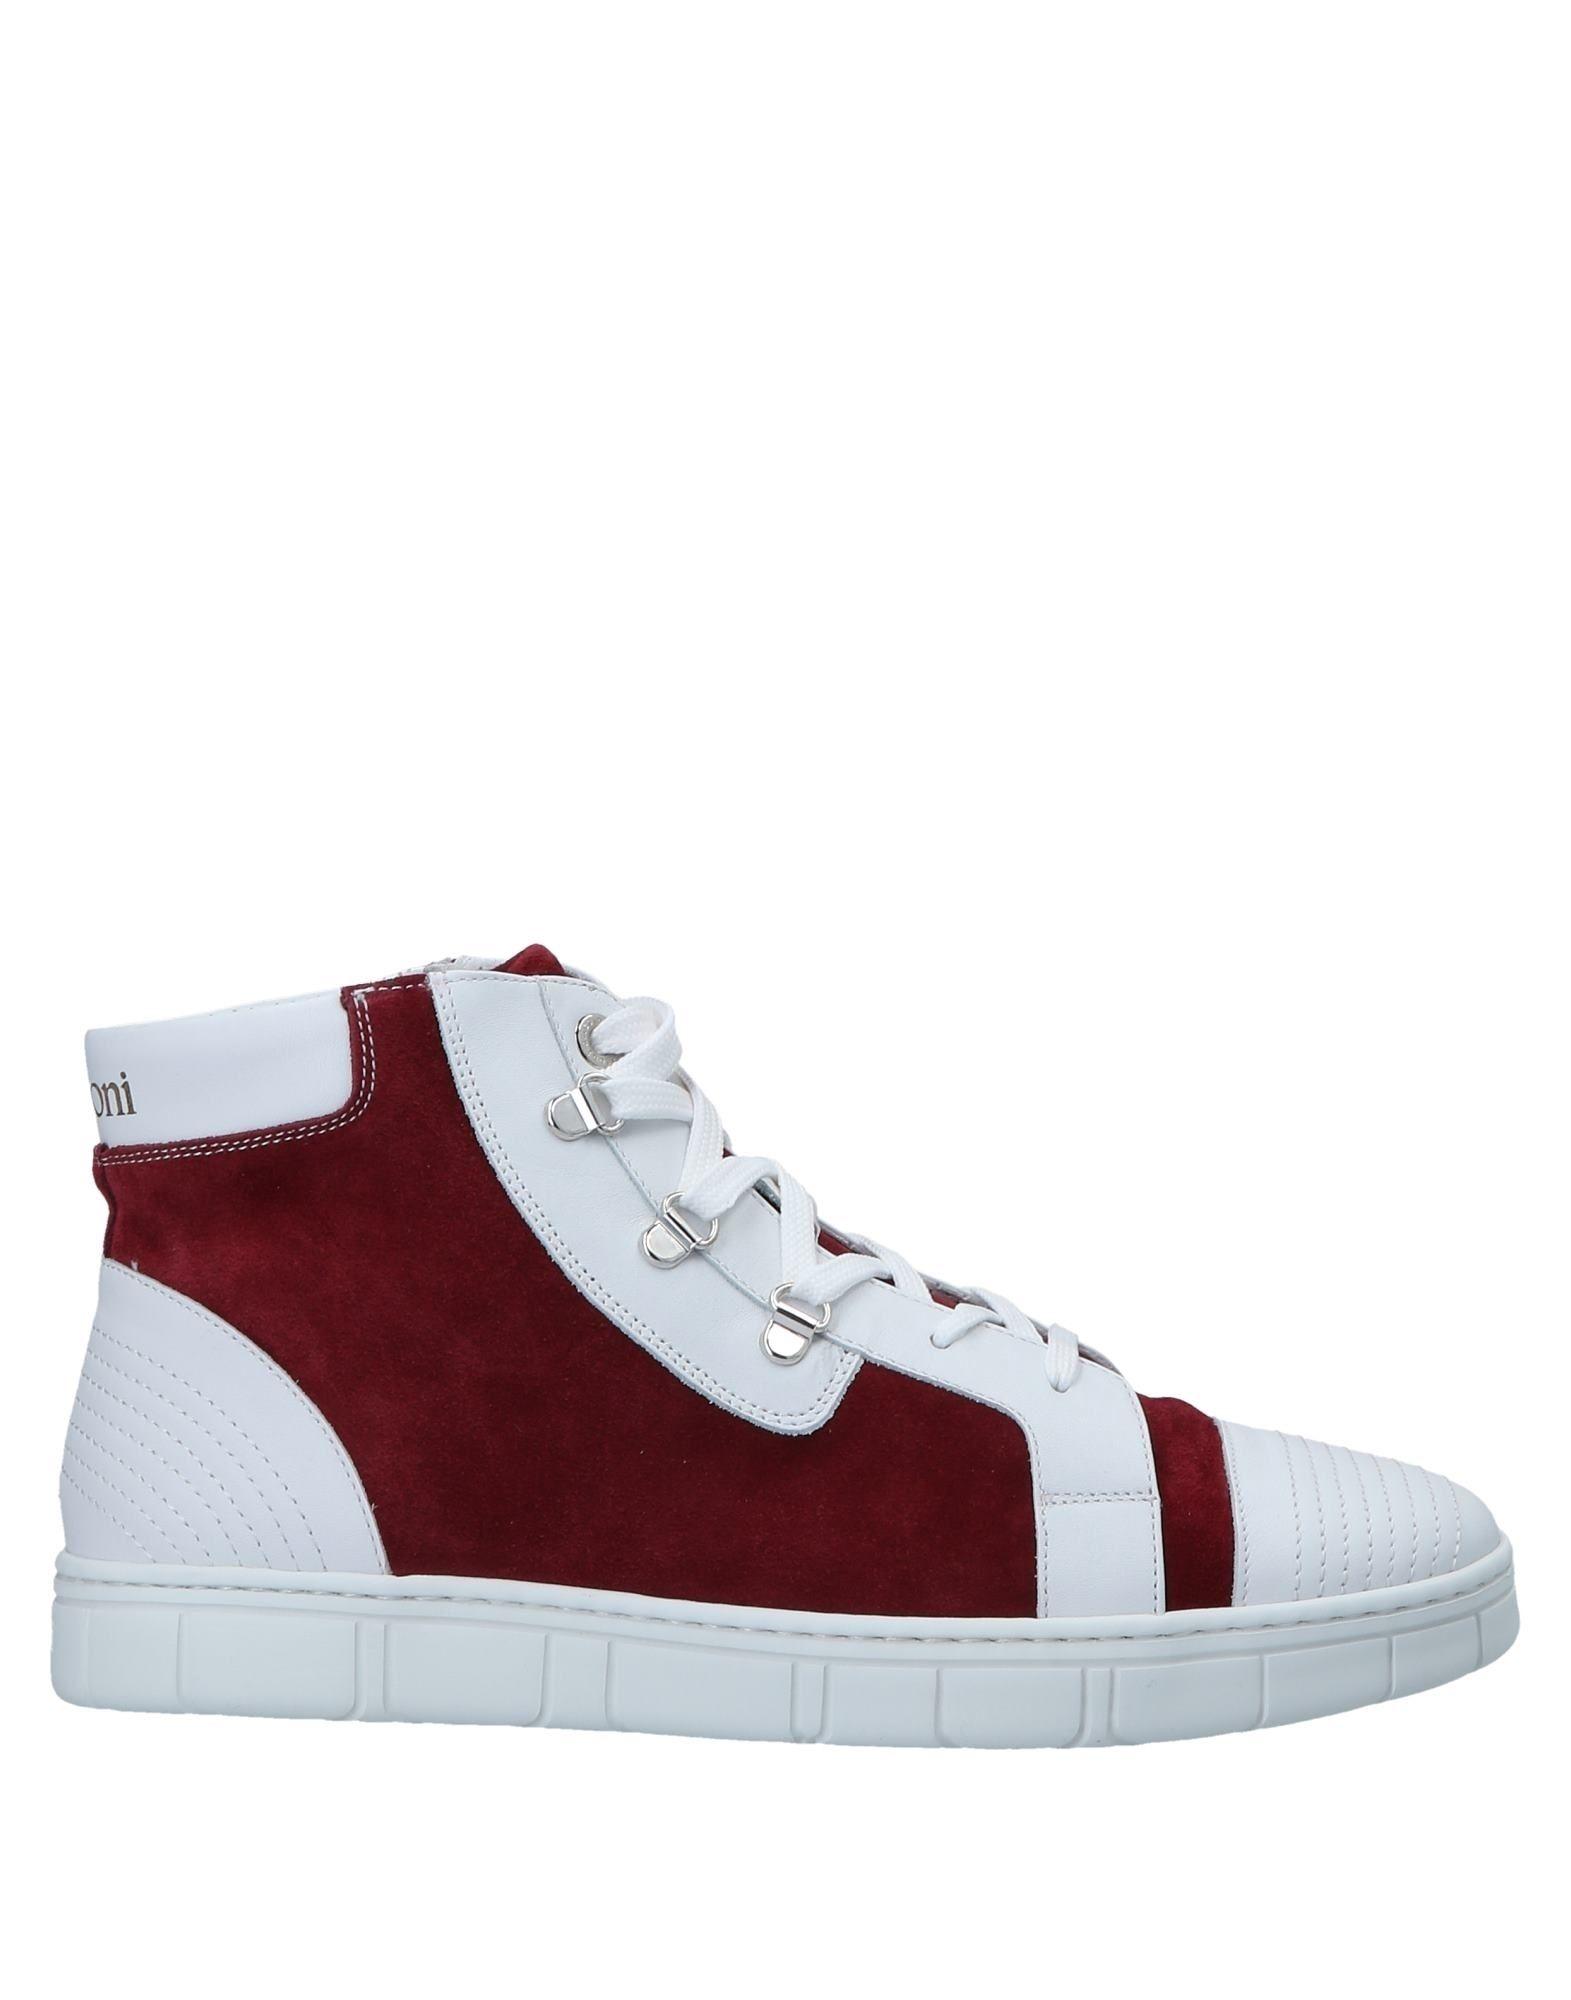 A.Testoni Sneakers Herren  beliebte 11555580MU Gute Qualität beliebte  Schuhe e72105